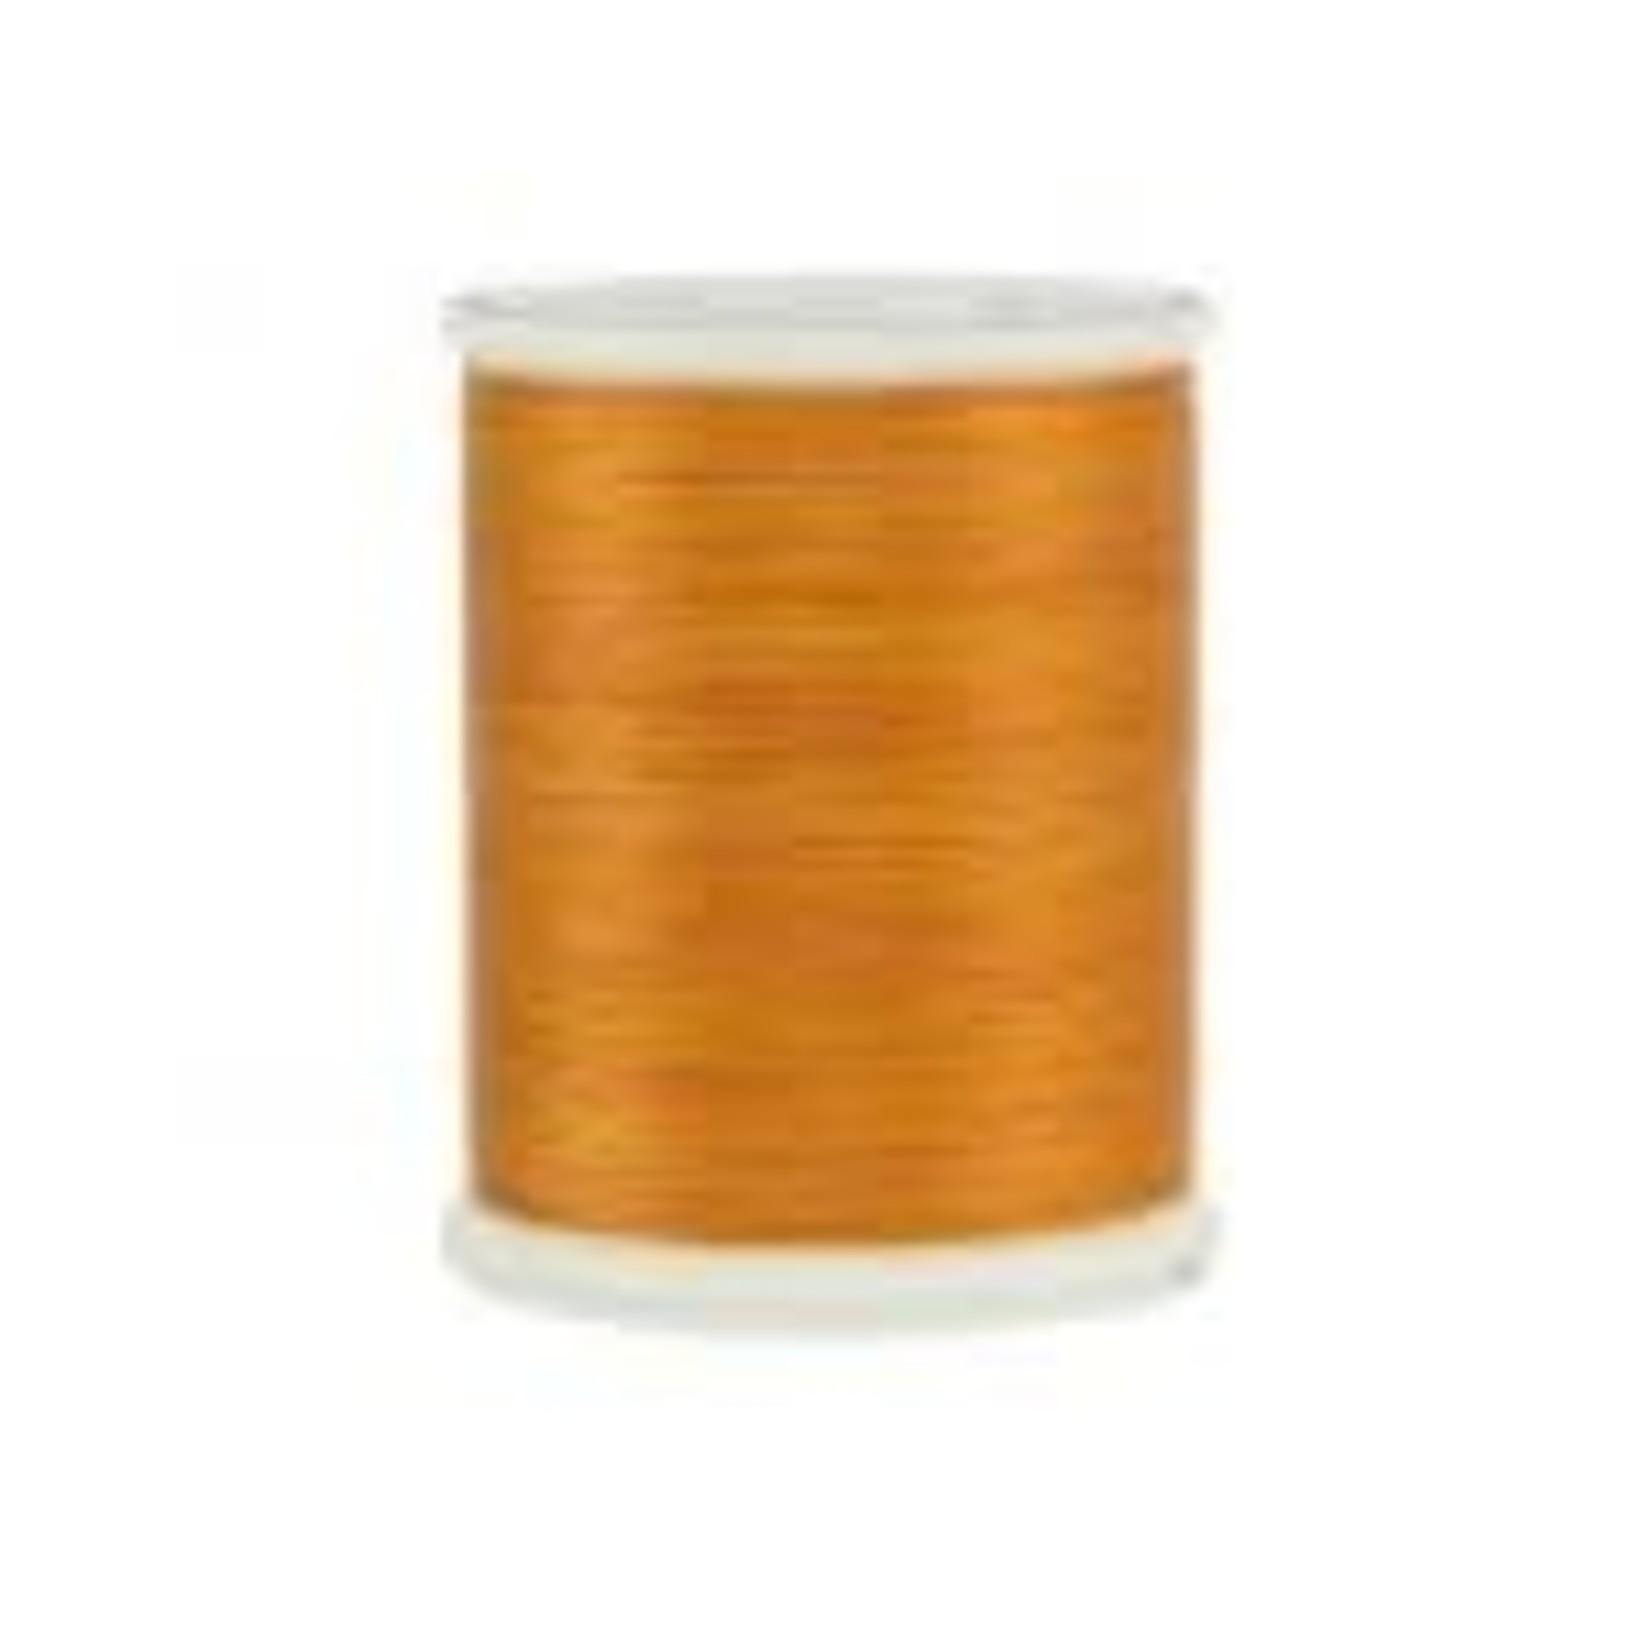 Superior Threads King Tut - #40 - 457 m - 0912 St. George